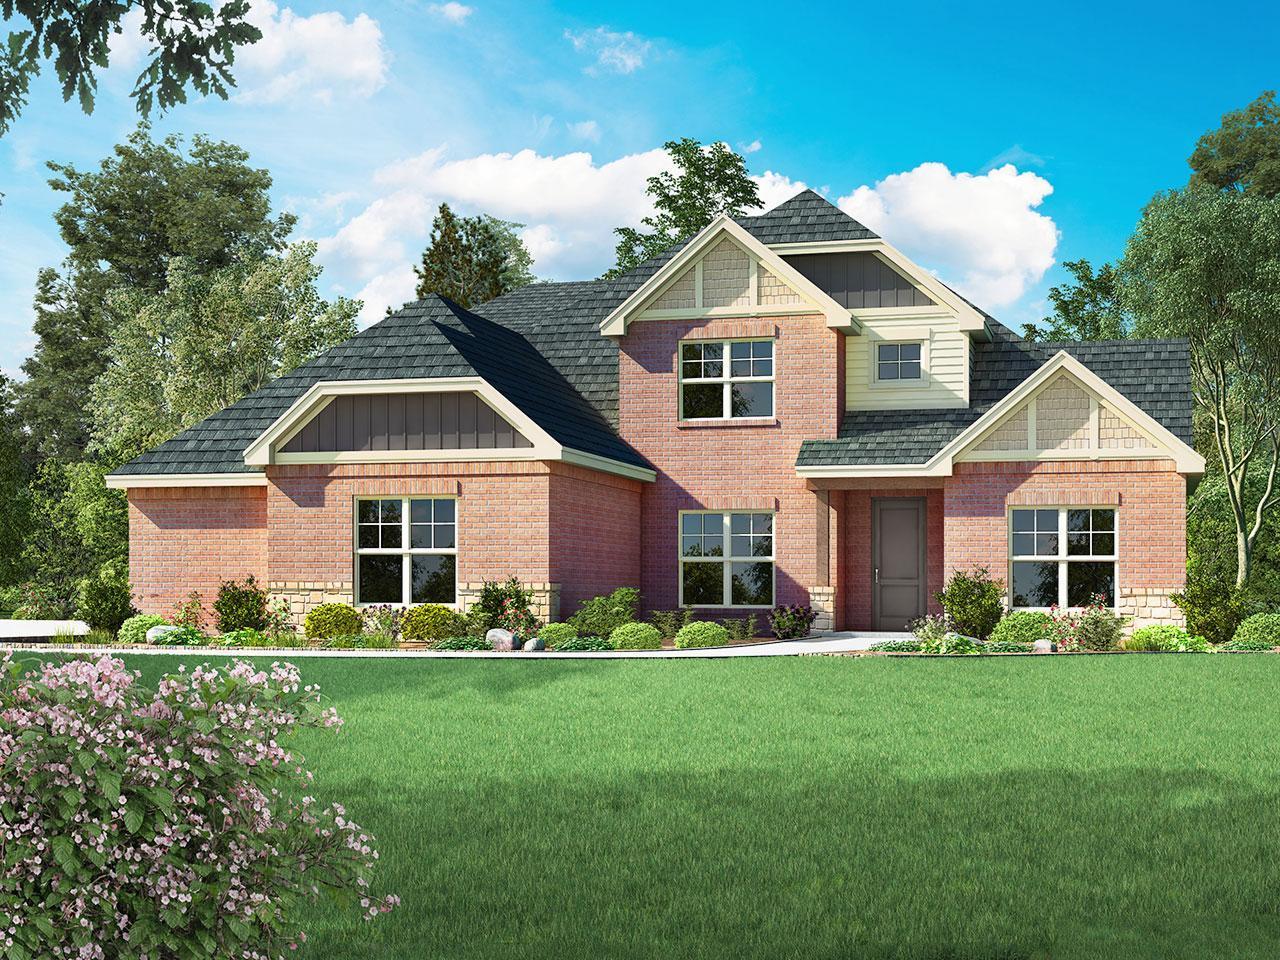 Single Family for Sale at Asheville - Bainbridge - 3cs Choctaw, Oklahoma 73020 United States